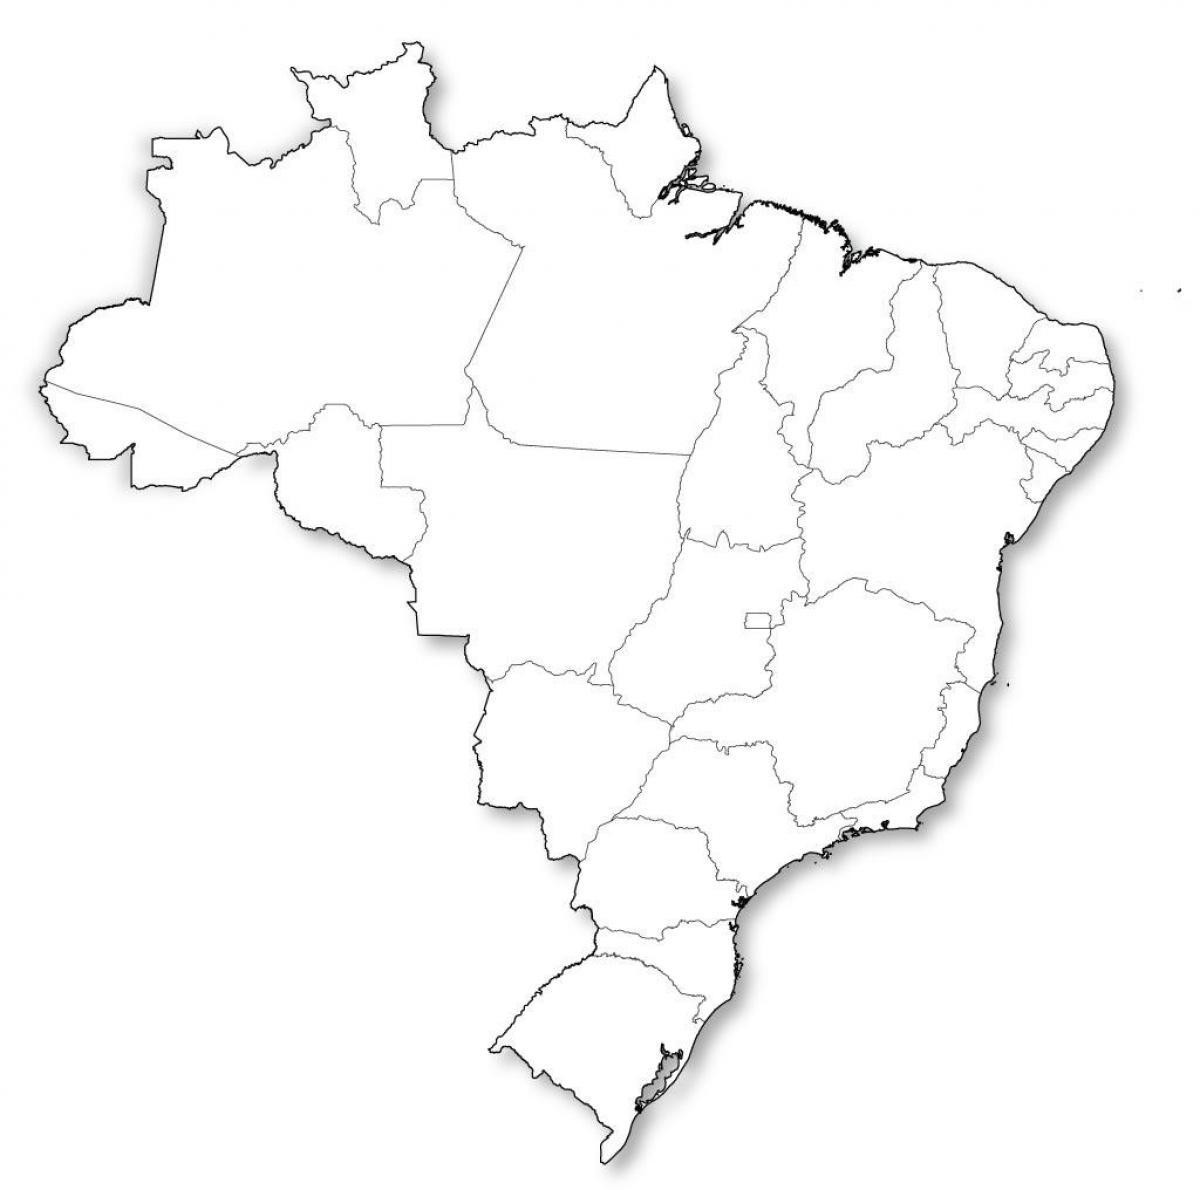 Carte Muette Bresil.Carte Vierge Amerique Latine